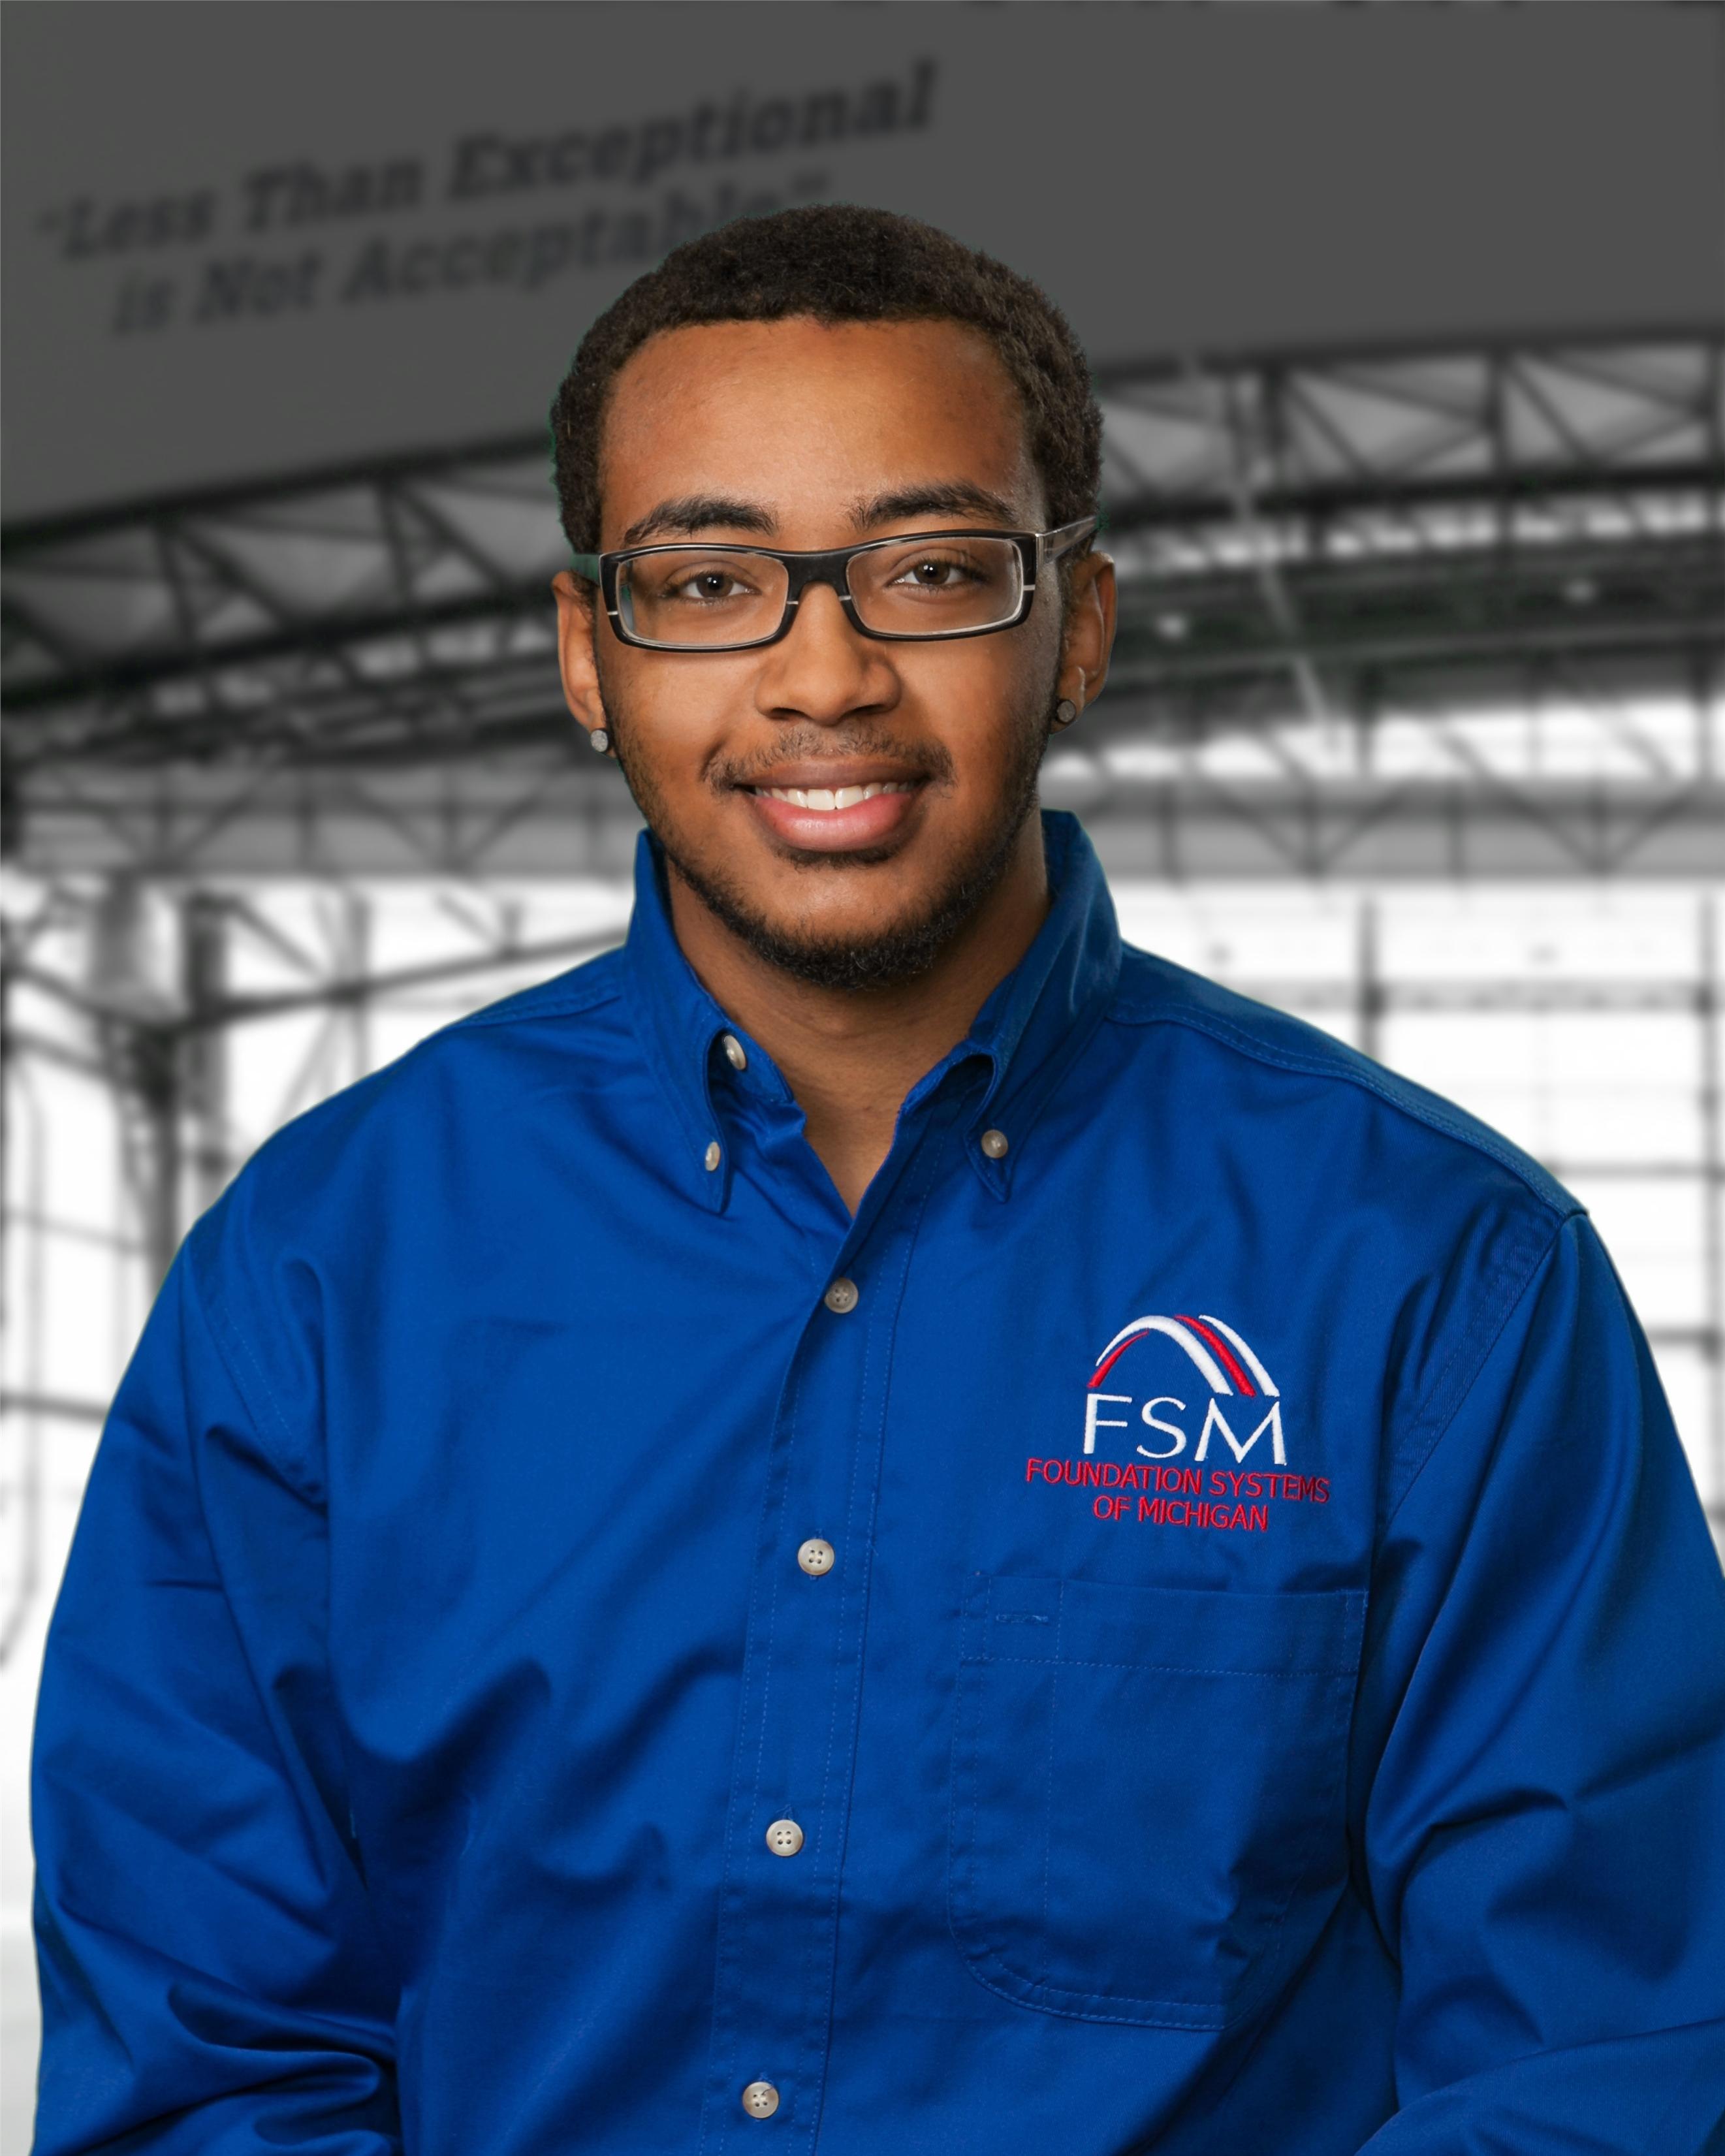 FSM Kivandre Kelley Foreman